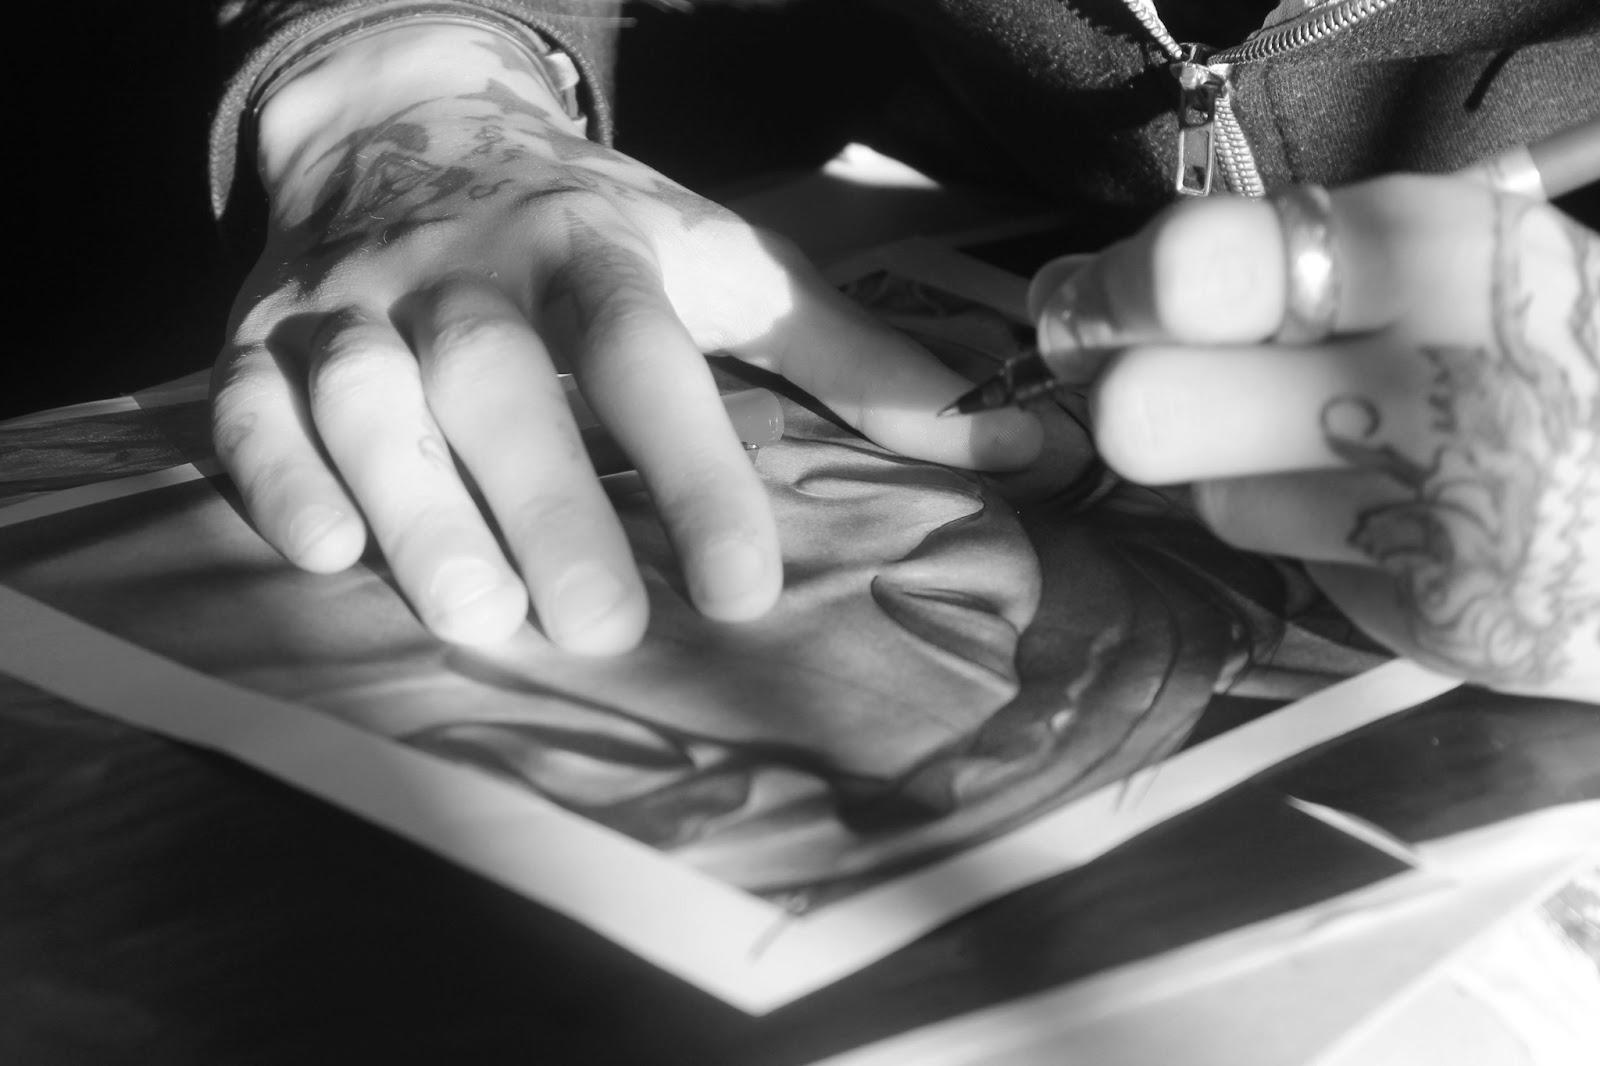 fredimix tattoo calquer un dessin avec feuille